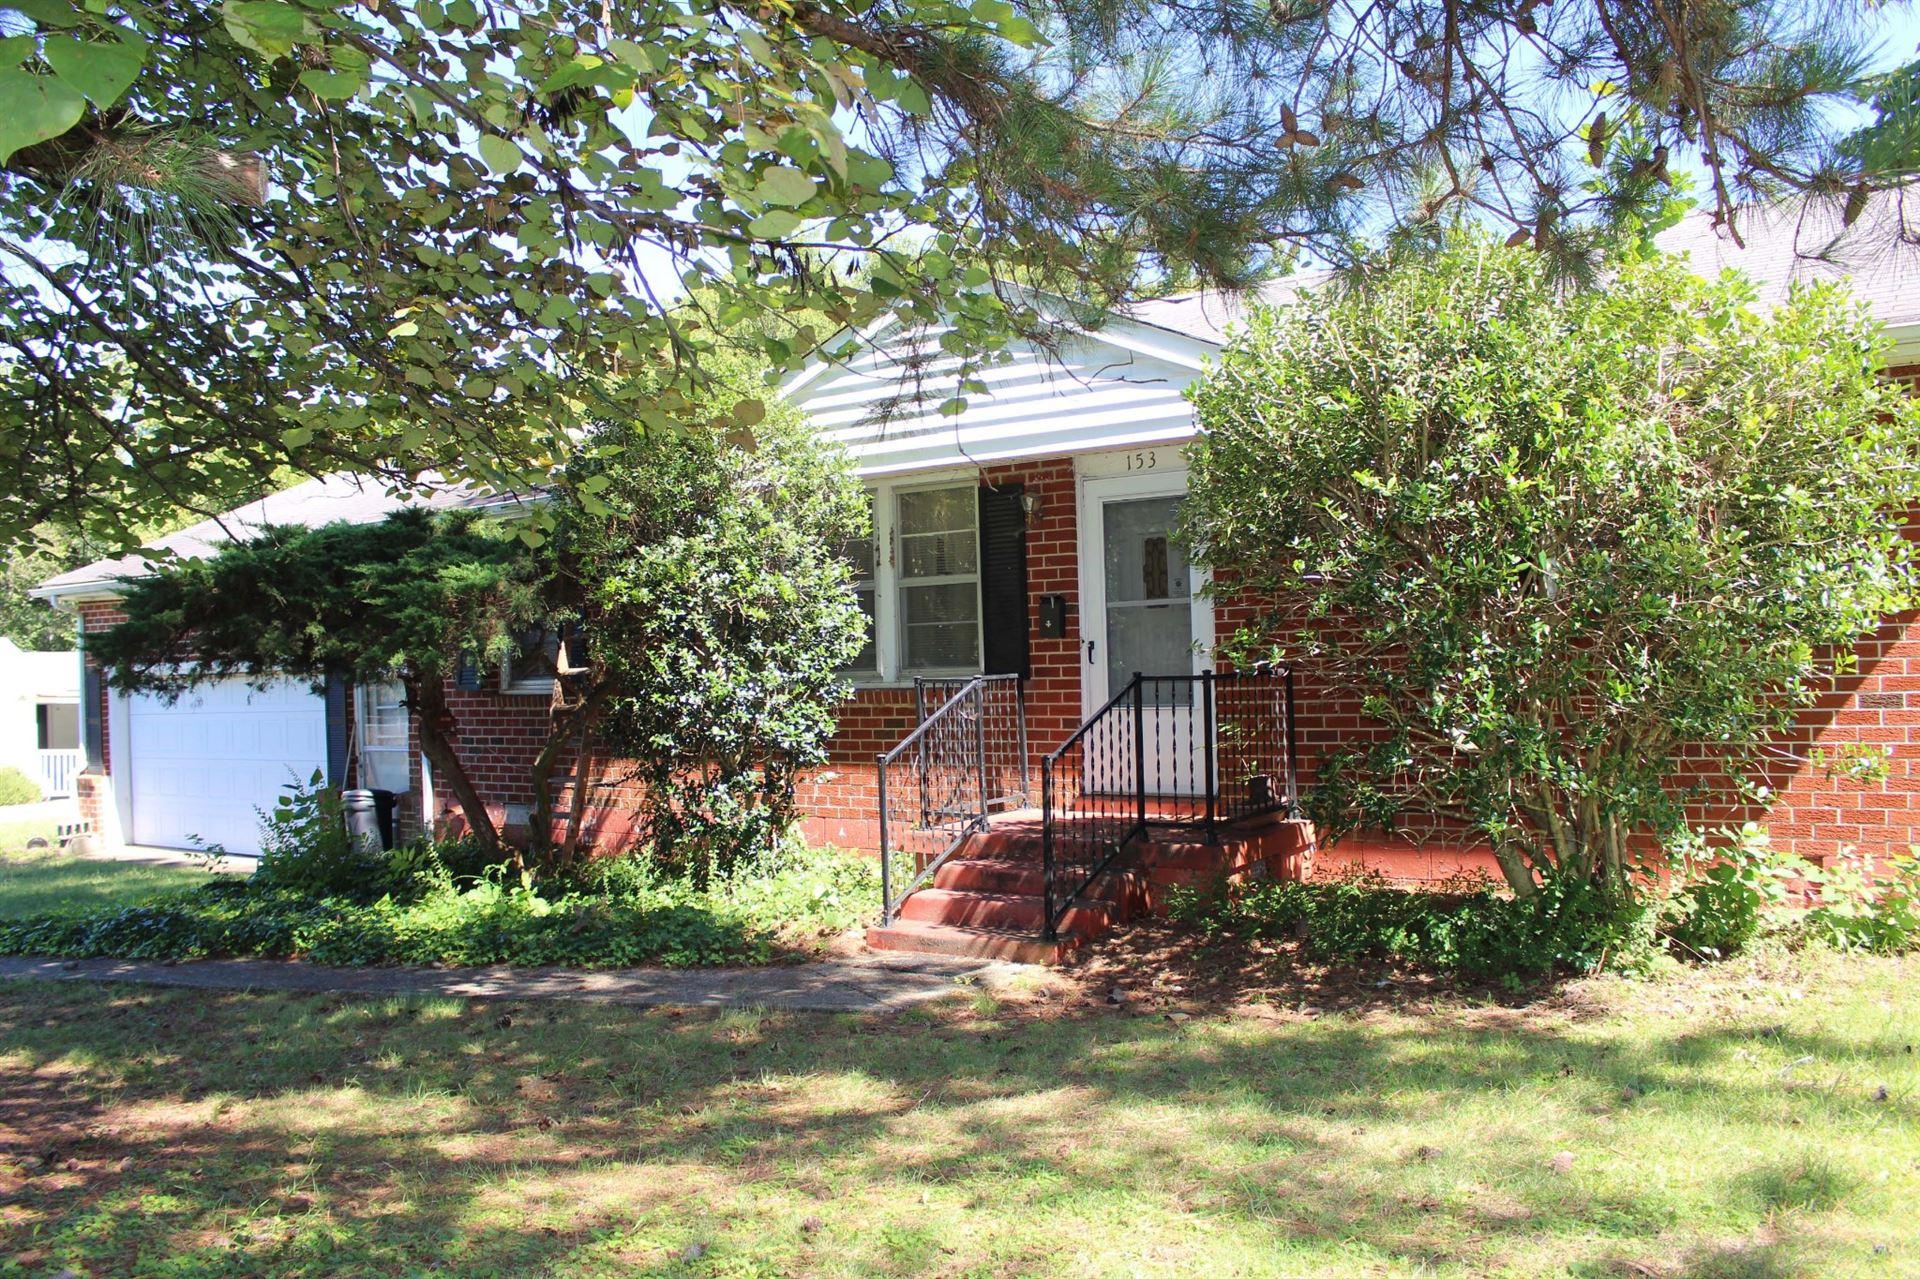 153 Hazelwood Ln, La Vergne, TN 37086 - MLS#: 2298445